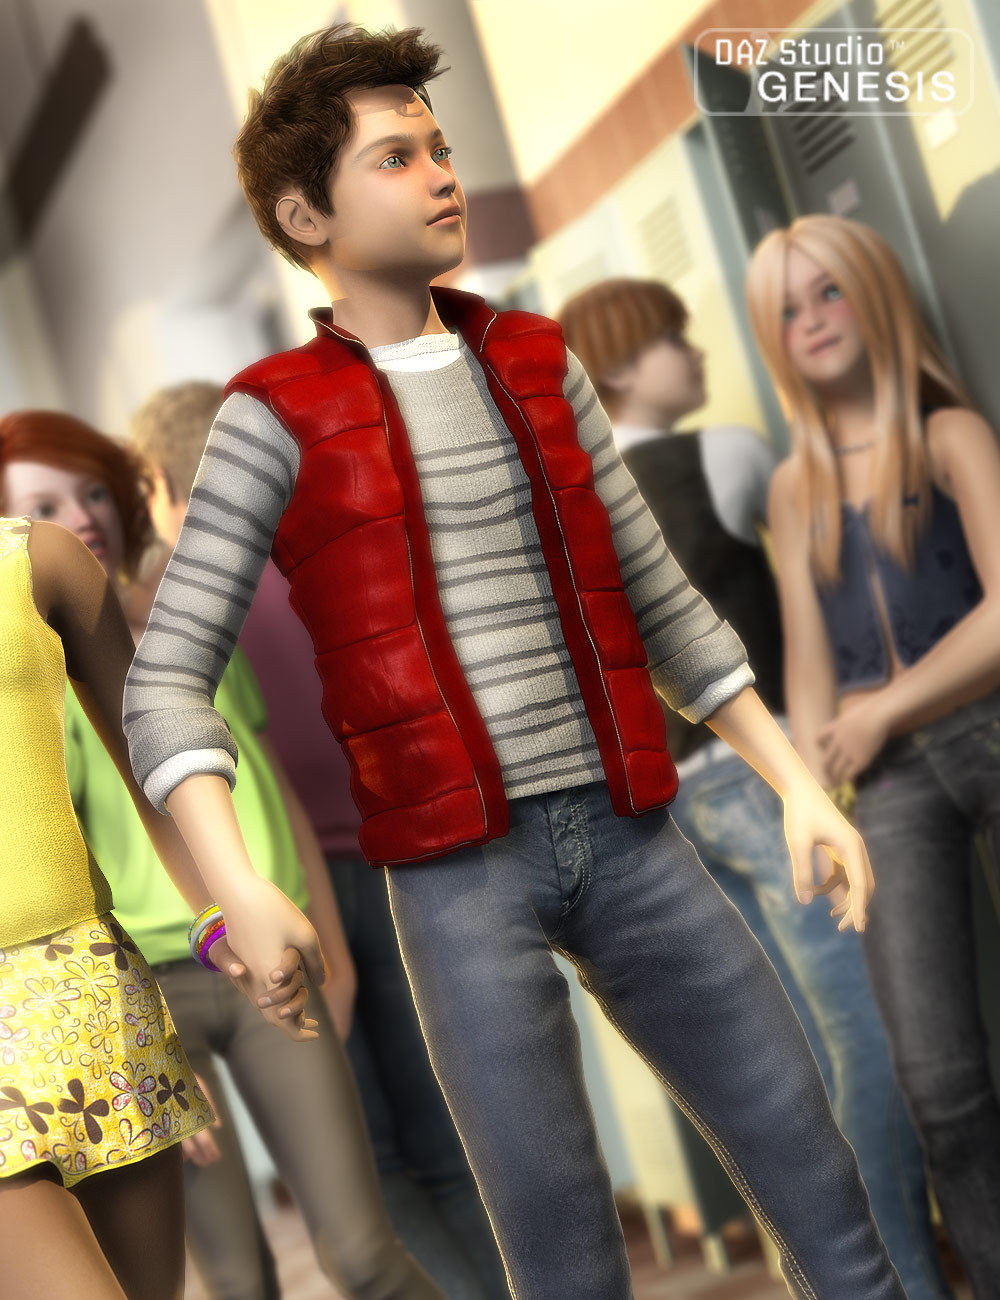 Teen Swag by: Barbara BrundonSarsa, 3D Models by Daz 3D